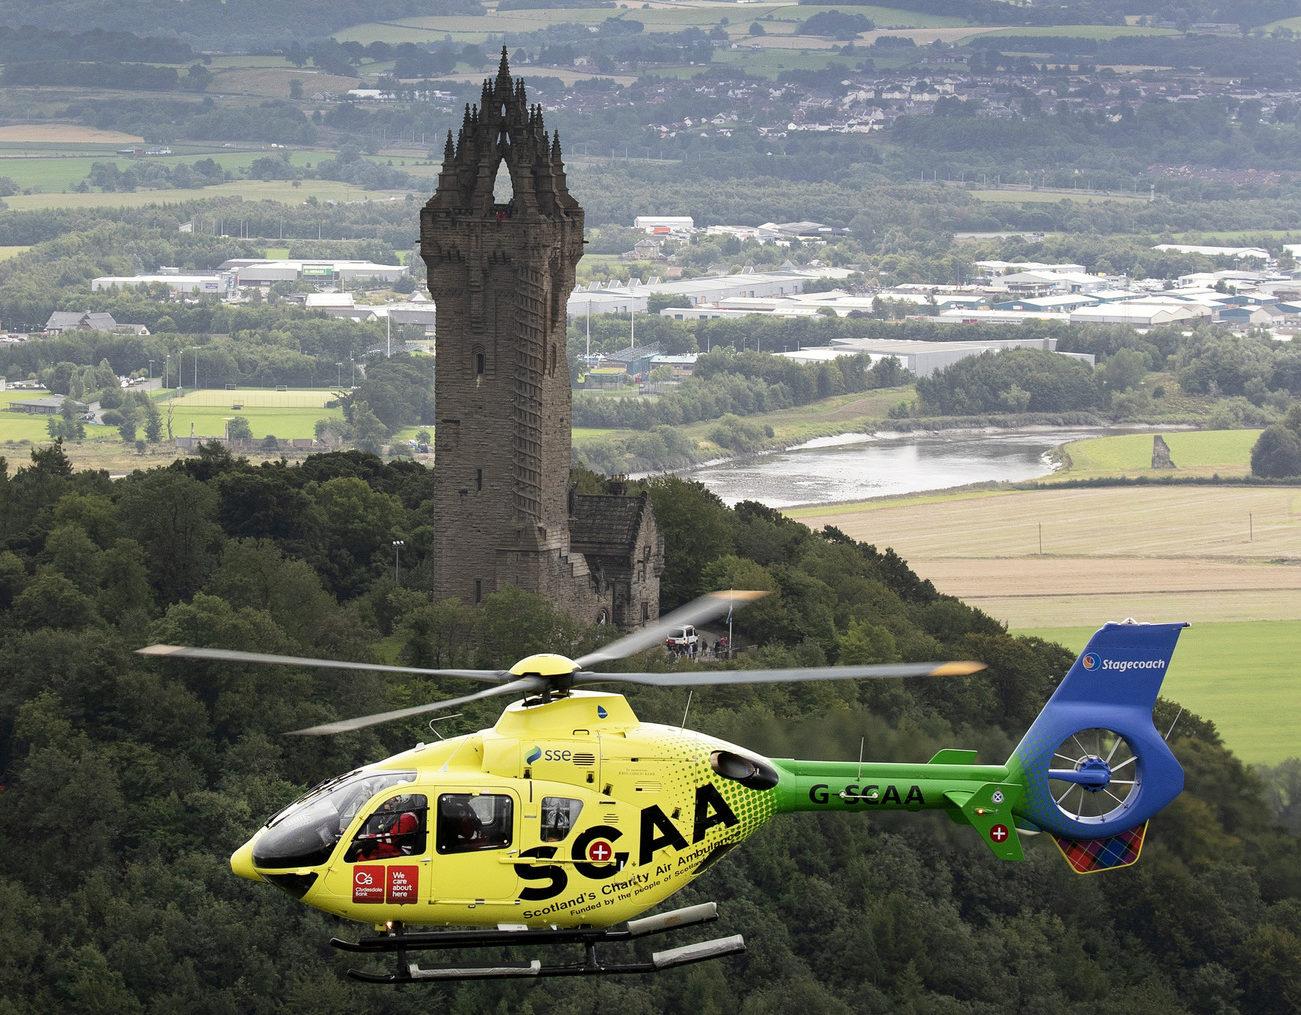 Scotlands Charity Air Ambulance (SCAA)